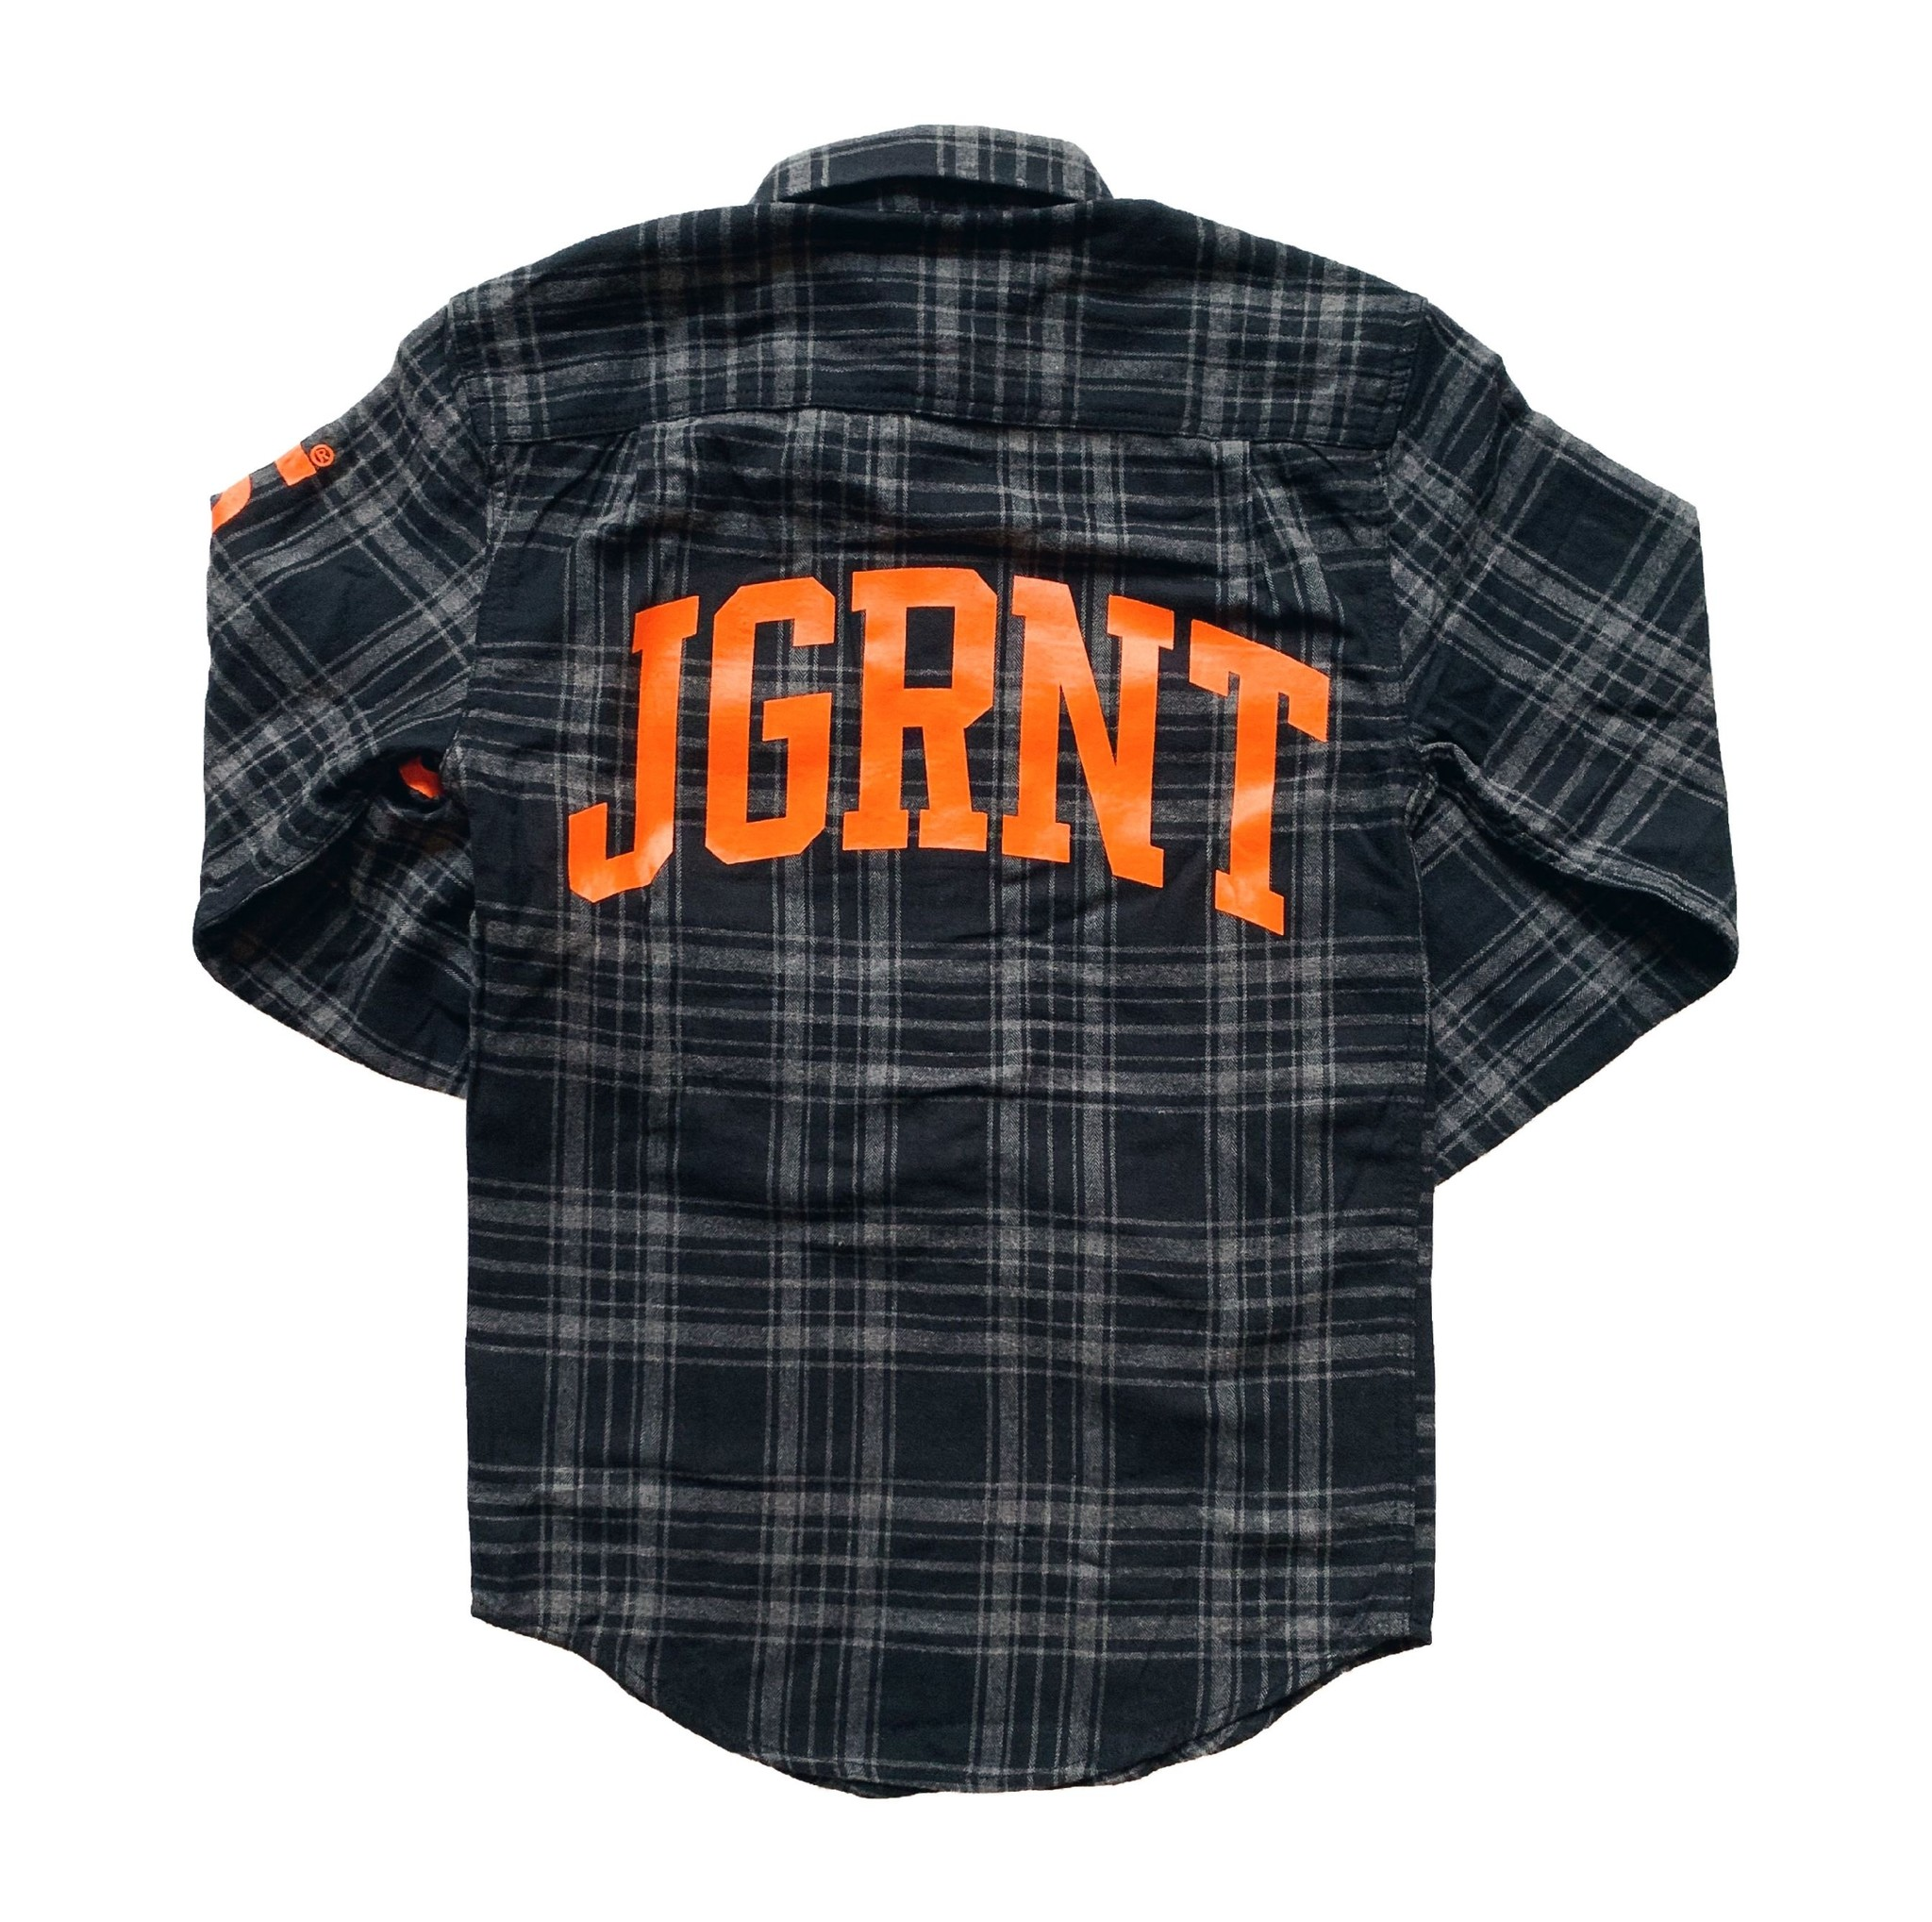 Jugrnaut Jugrnaut Worldwide Flannel Black/Orange